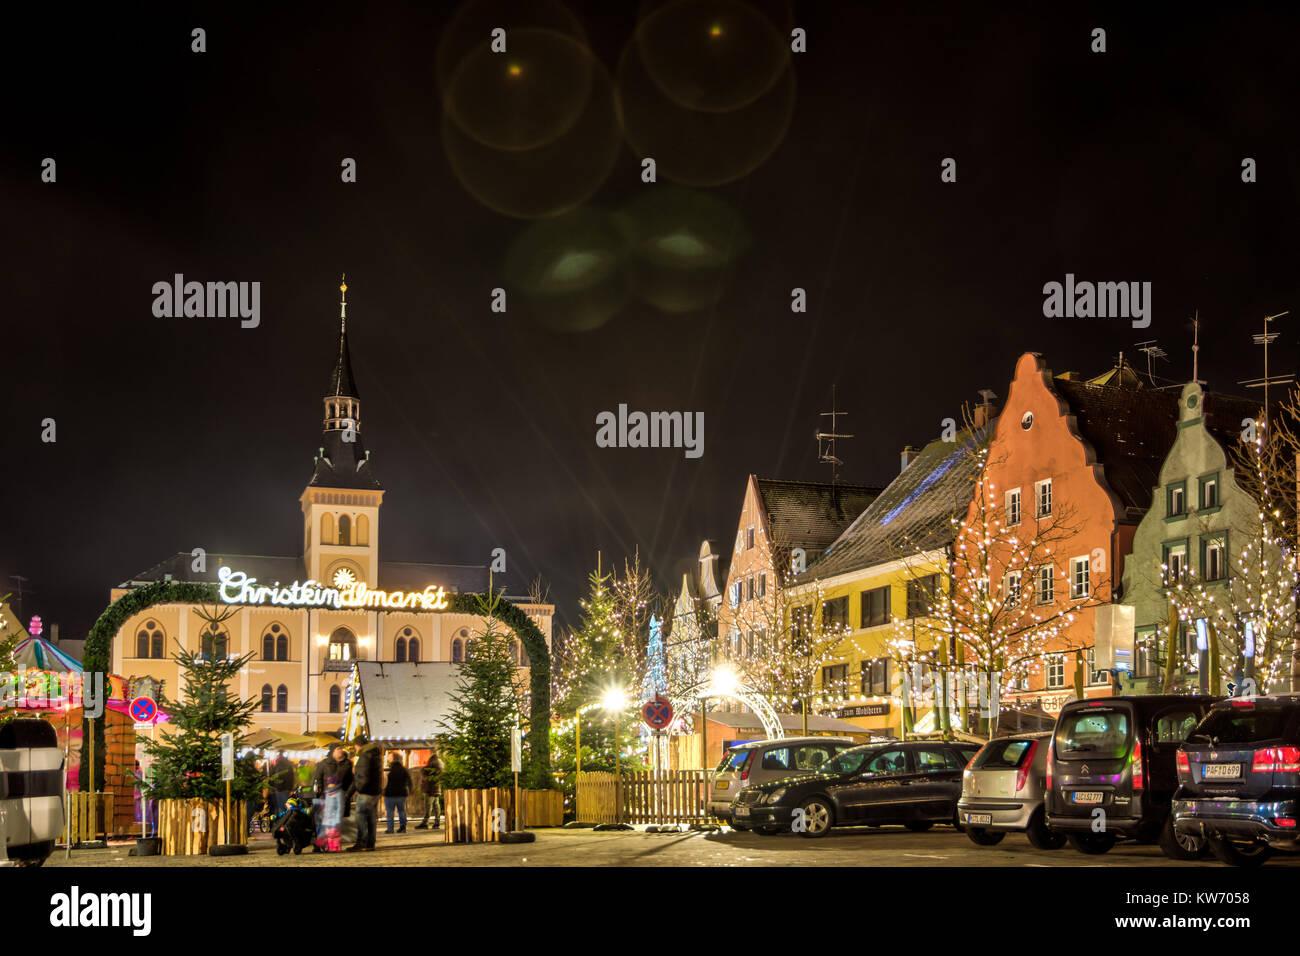 PFAFFENHOFEN, GERMANY - DEZEMBER 17: People at a traditional bavarian christmas market in Pfaffenhofen, Germany - Stock Image